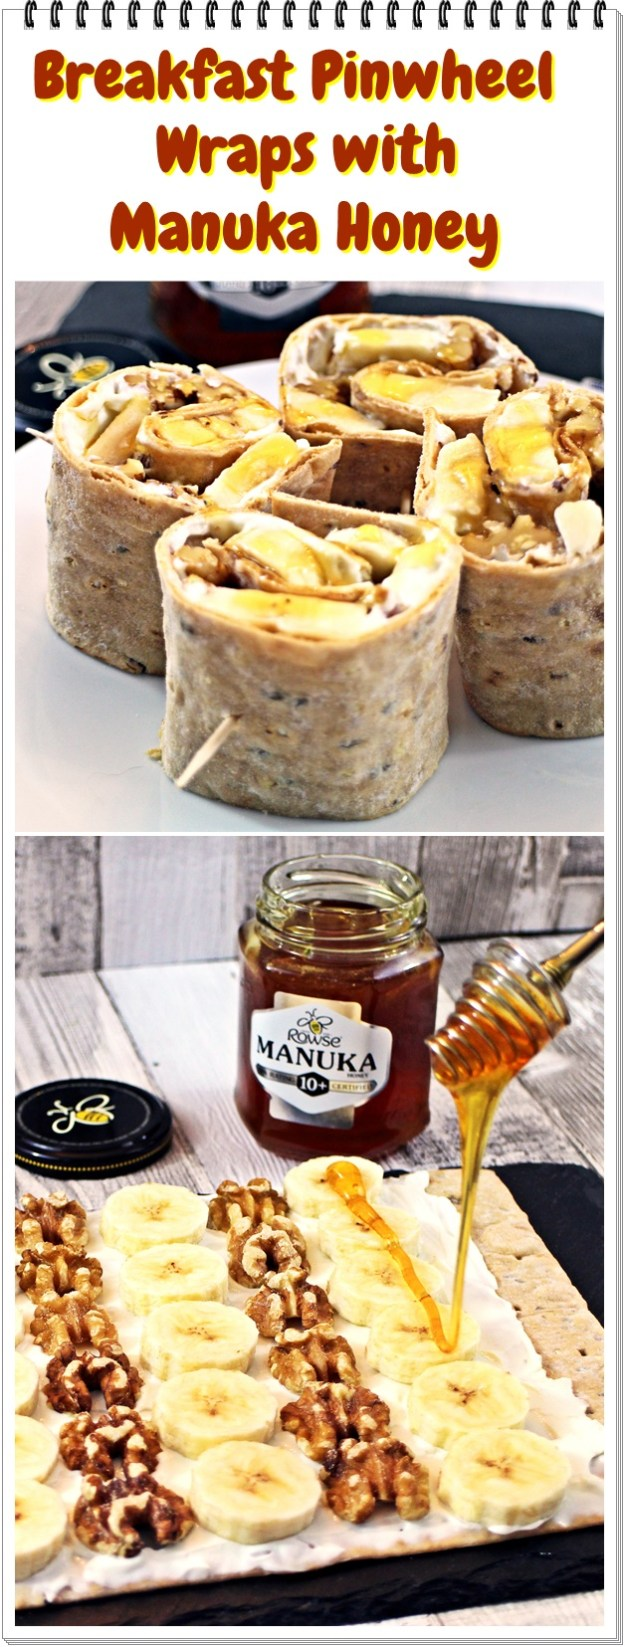 Breakfast Pinwheel Wraps with Manuka Honey - Fab Food 4 All